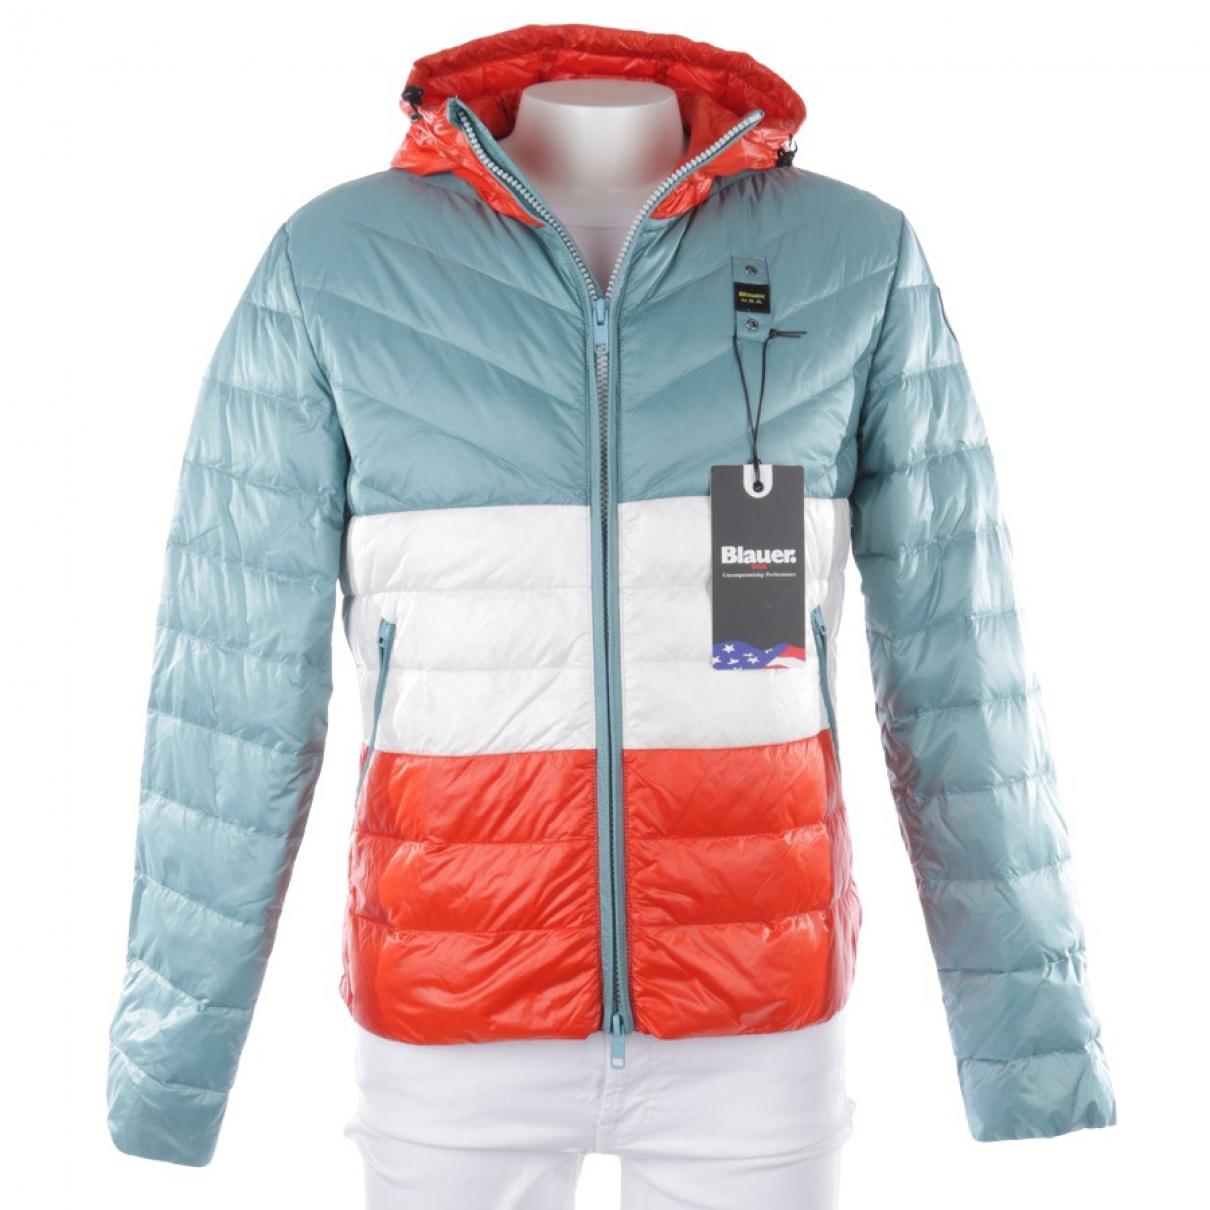 Blauer \N Blue jacket for Women 40 FR